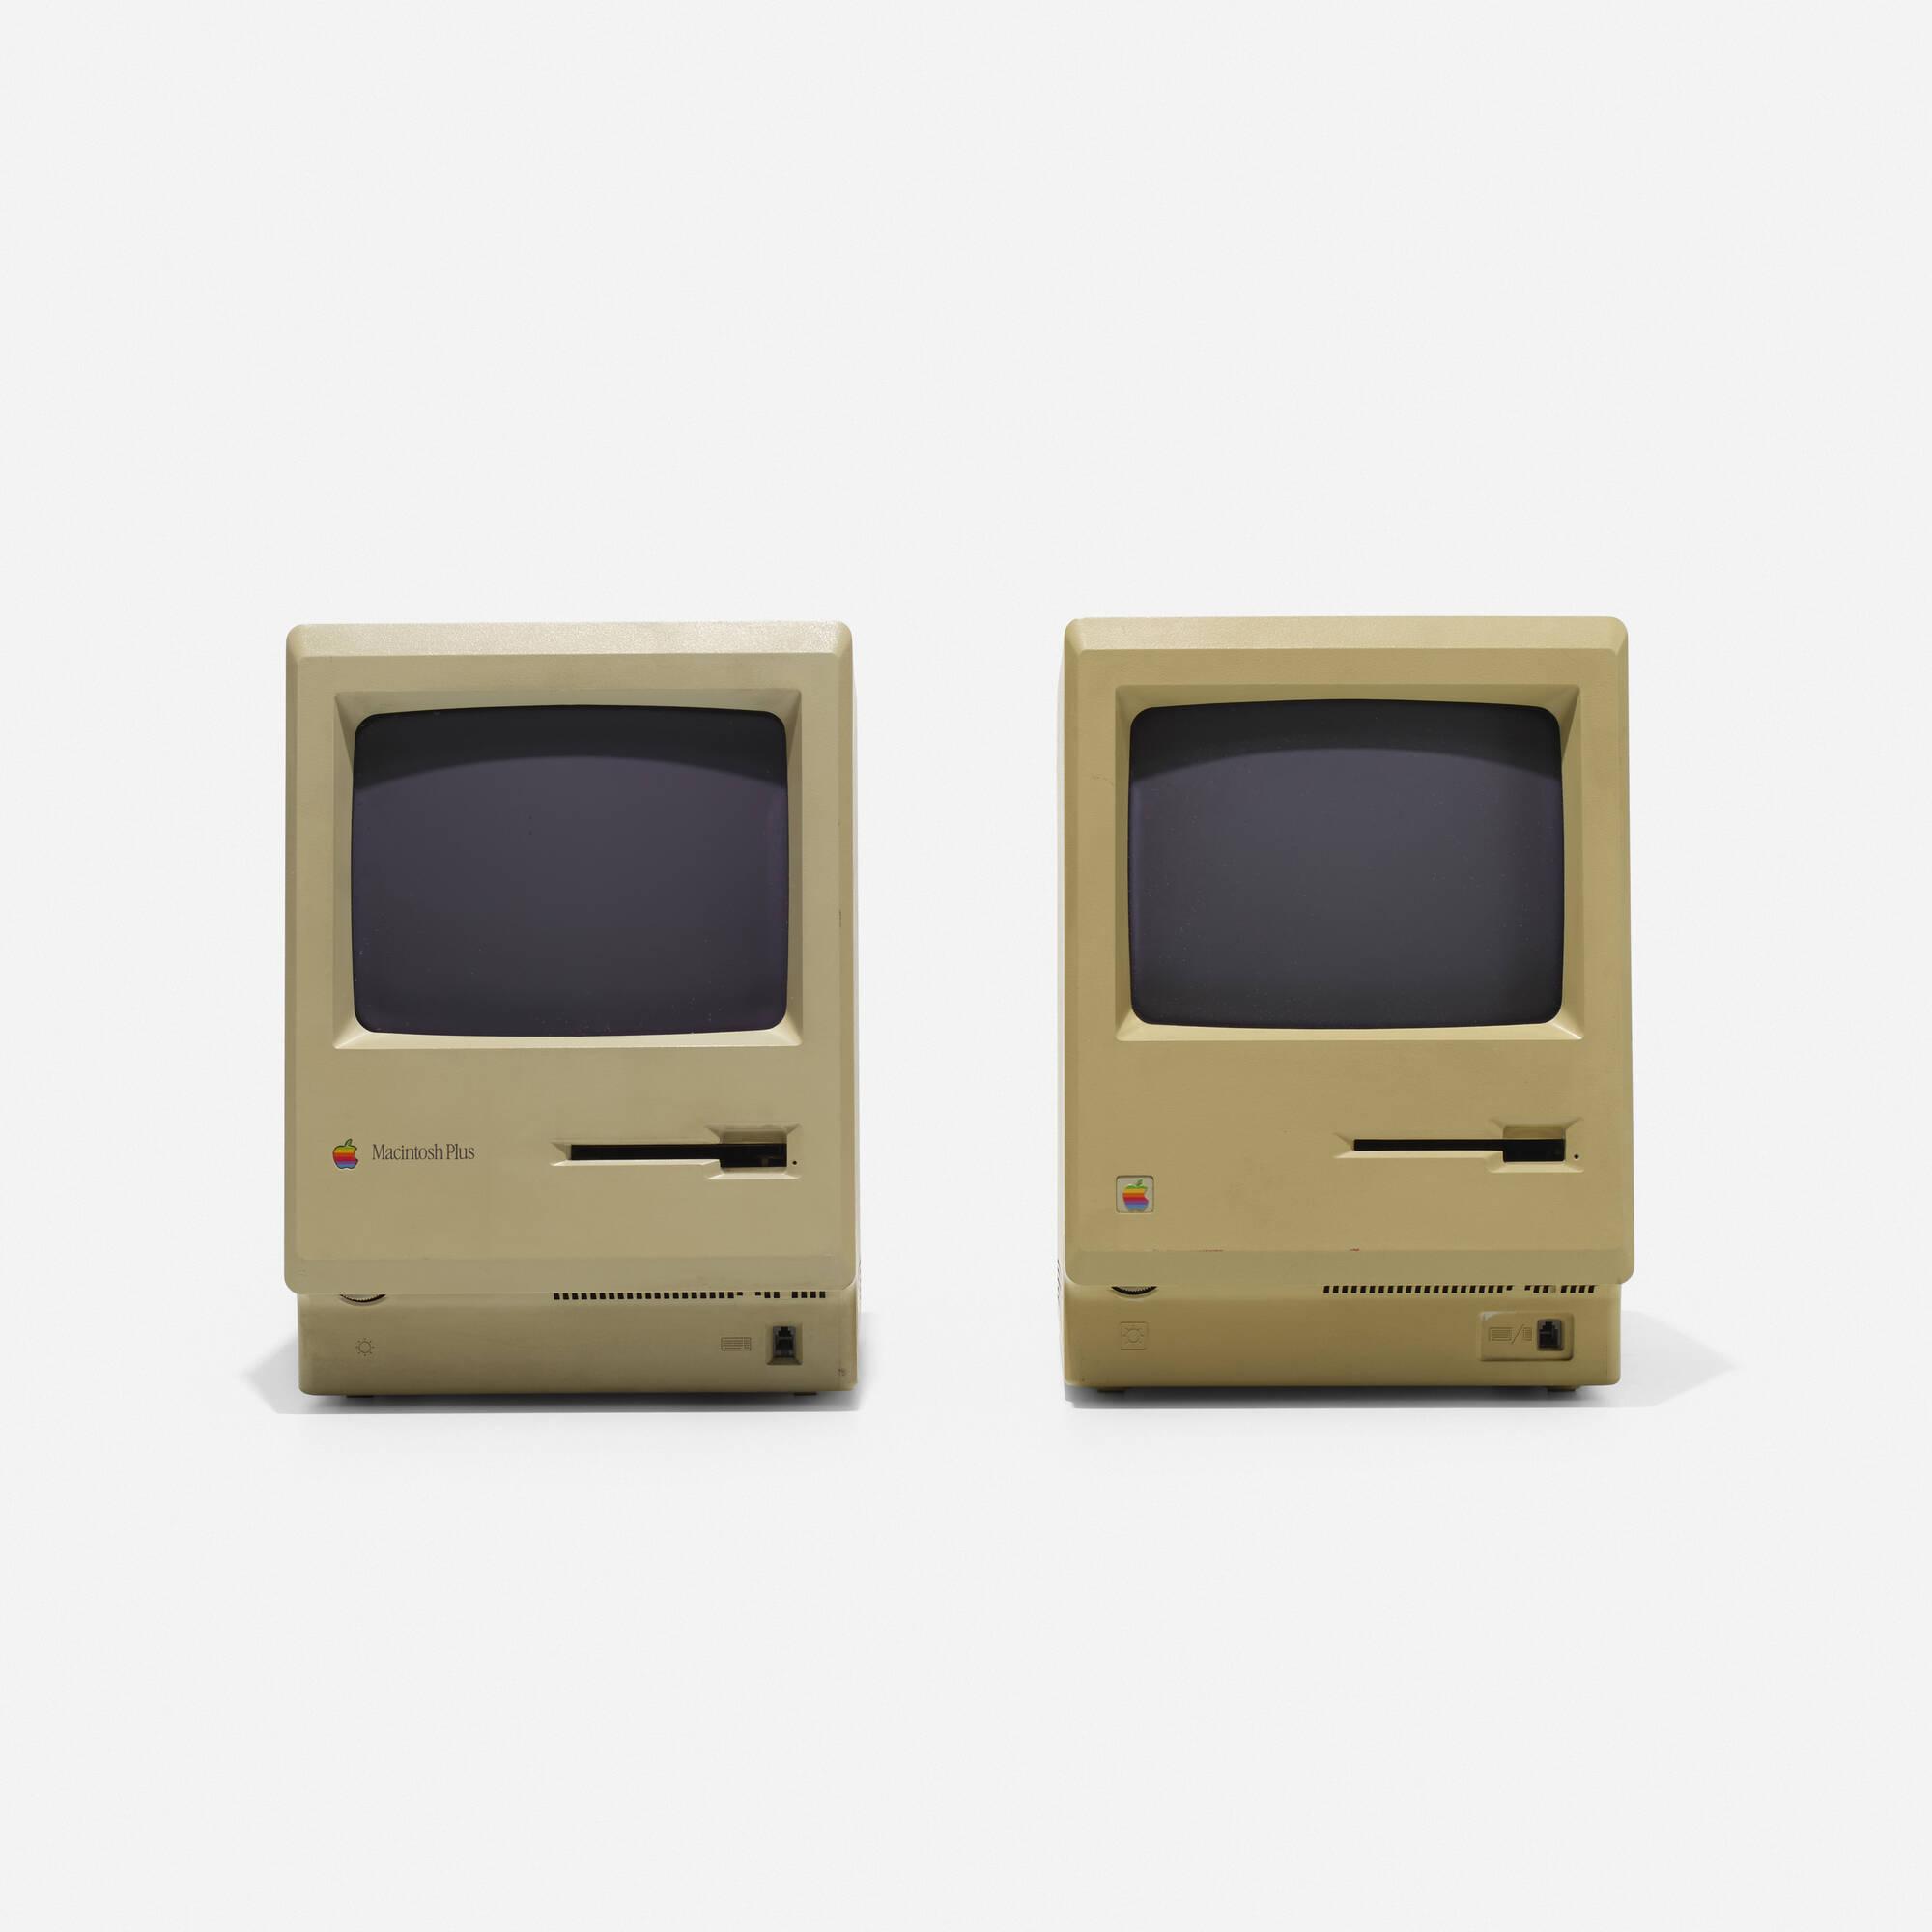 131: Frog Design / Apple Macintosh 512K Personal Computers, pair (2 of 2)